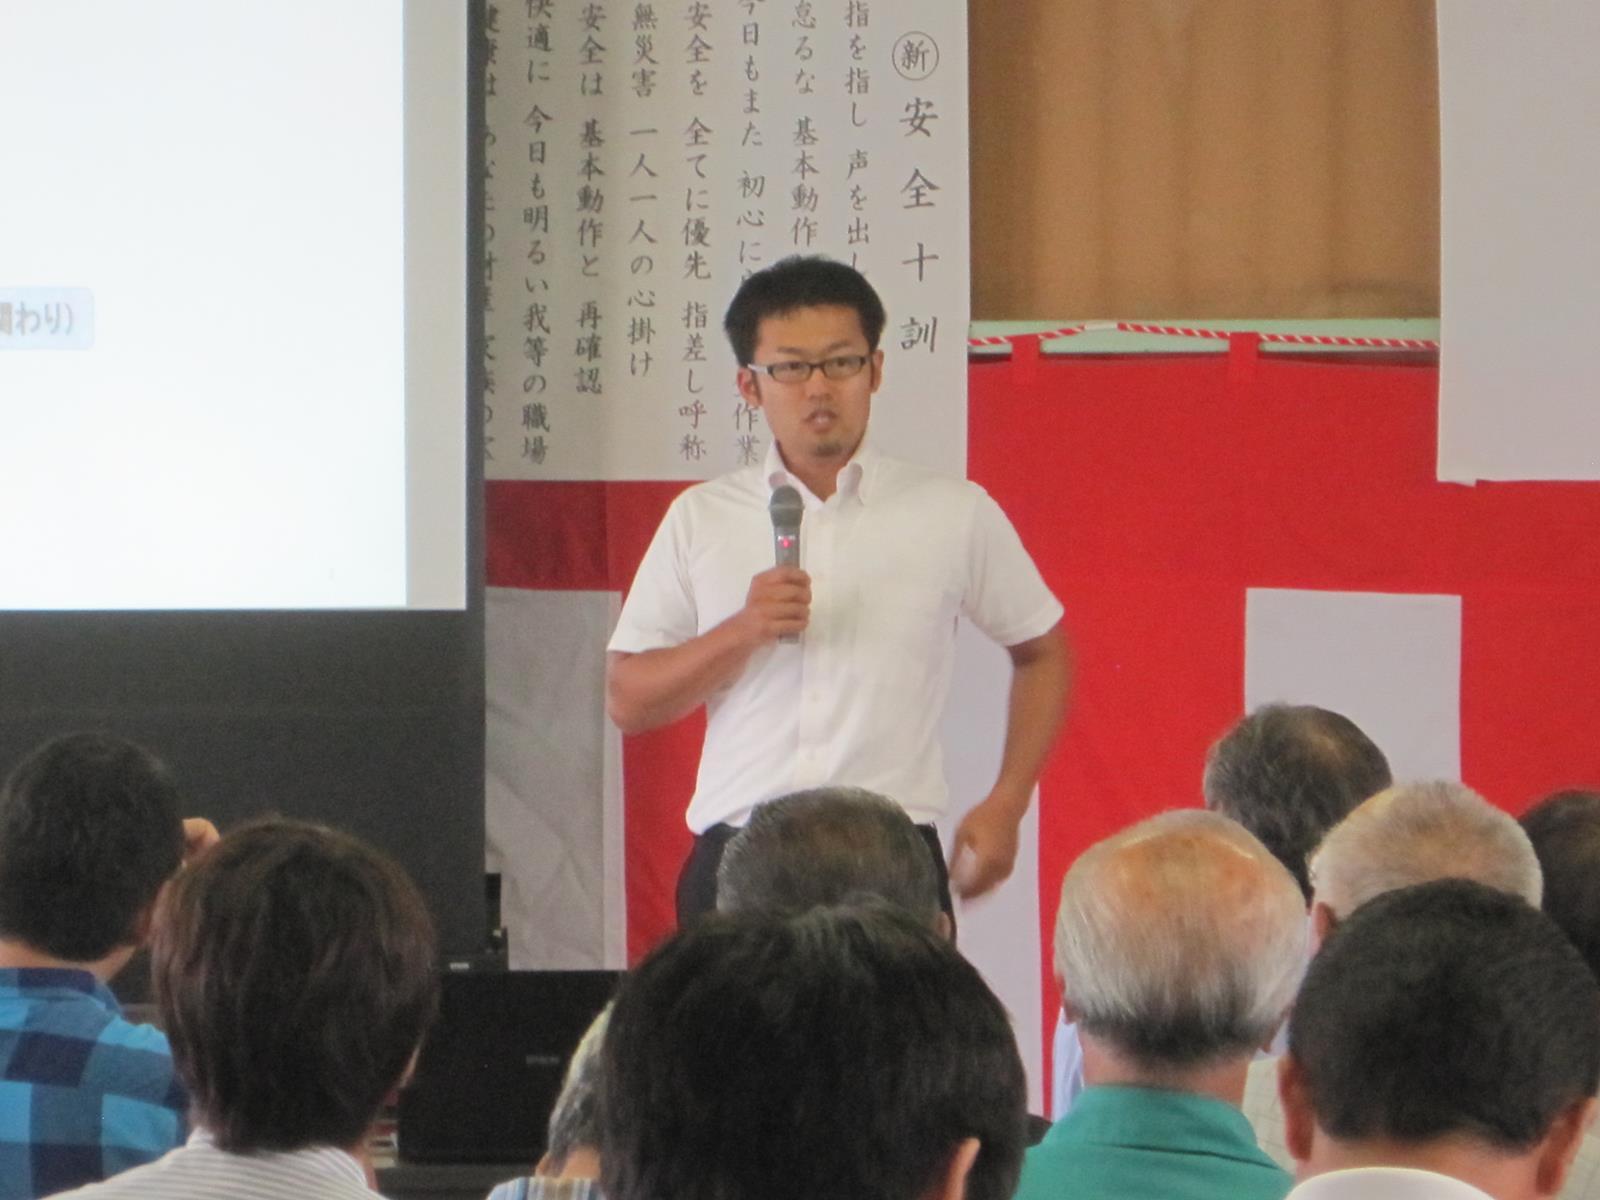 八戸市森林組合・第9回安全大会 株式会社あおもり海山取締役営業部長 野呂英樹講演の様子